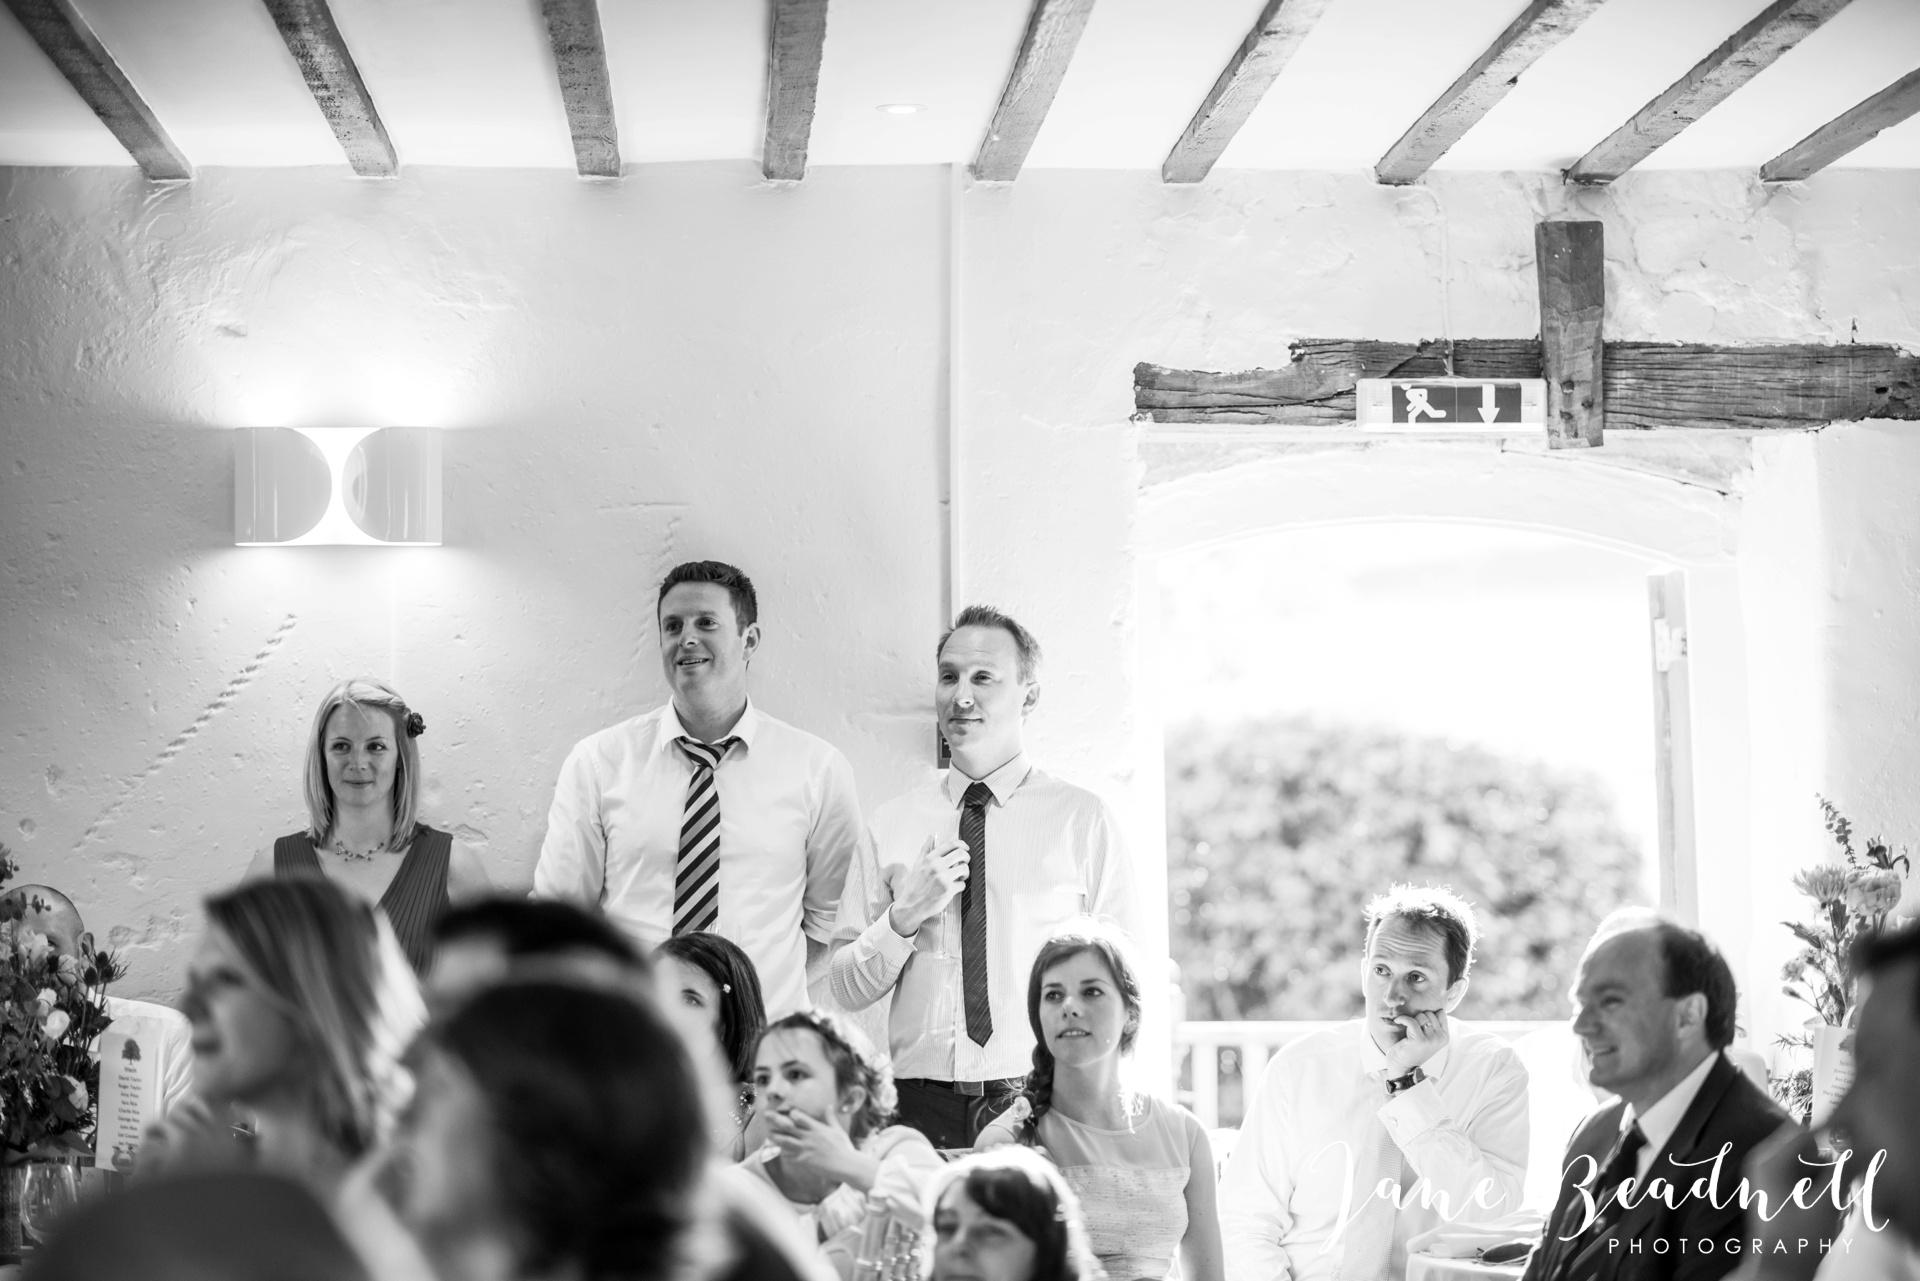 Bath Abbey wedding photography by fine art wedding photographer Leeds Jane Beadnell_60